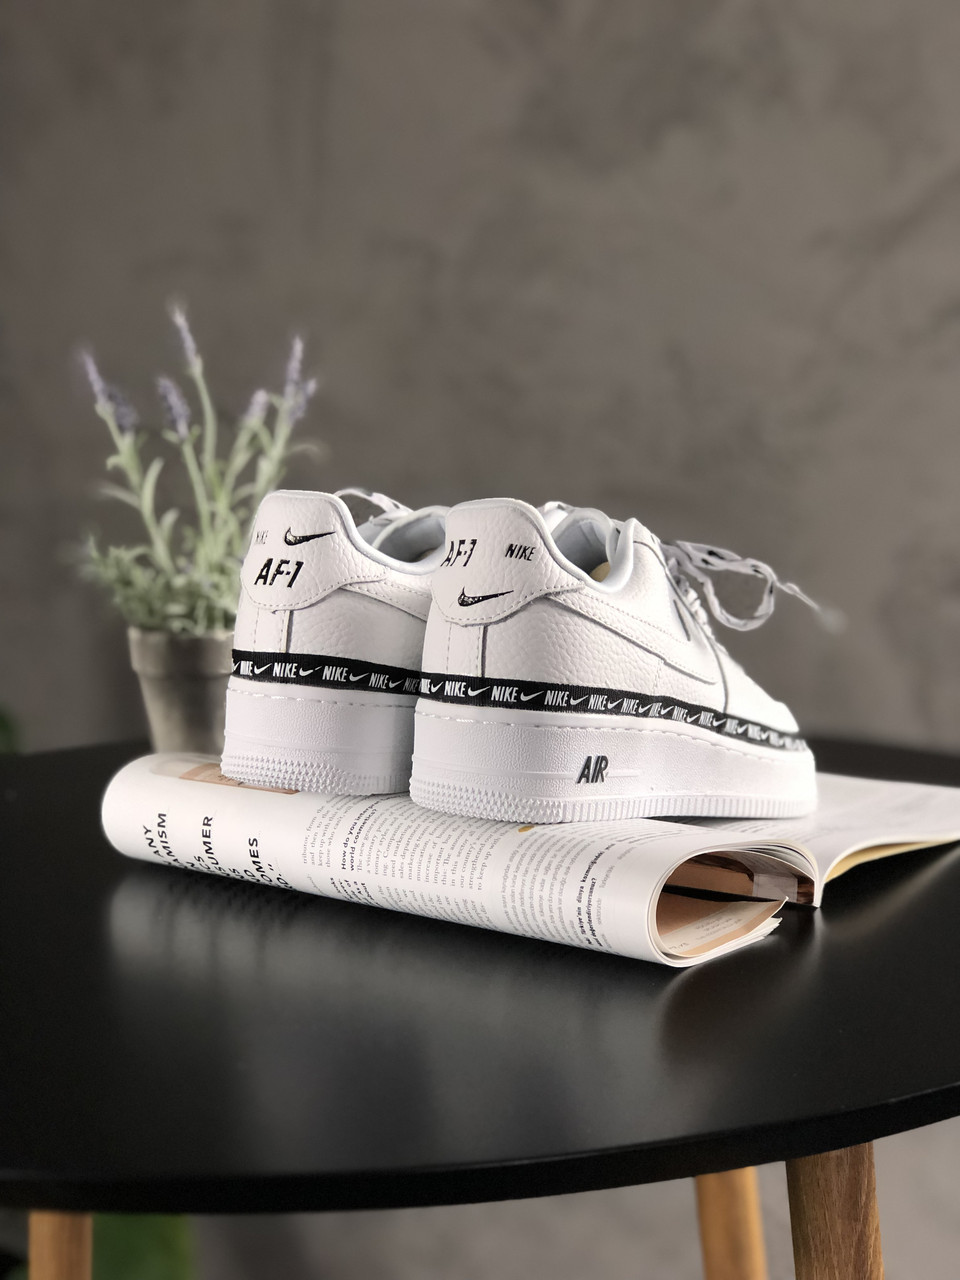 Кроссовки Nike Air Force 1 '07 Low SE Premium White Black 3